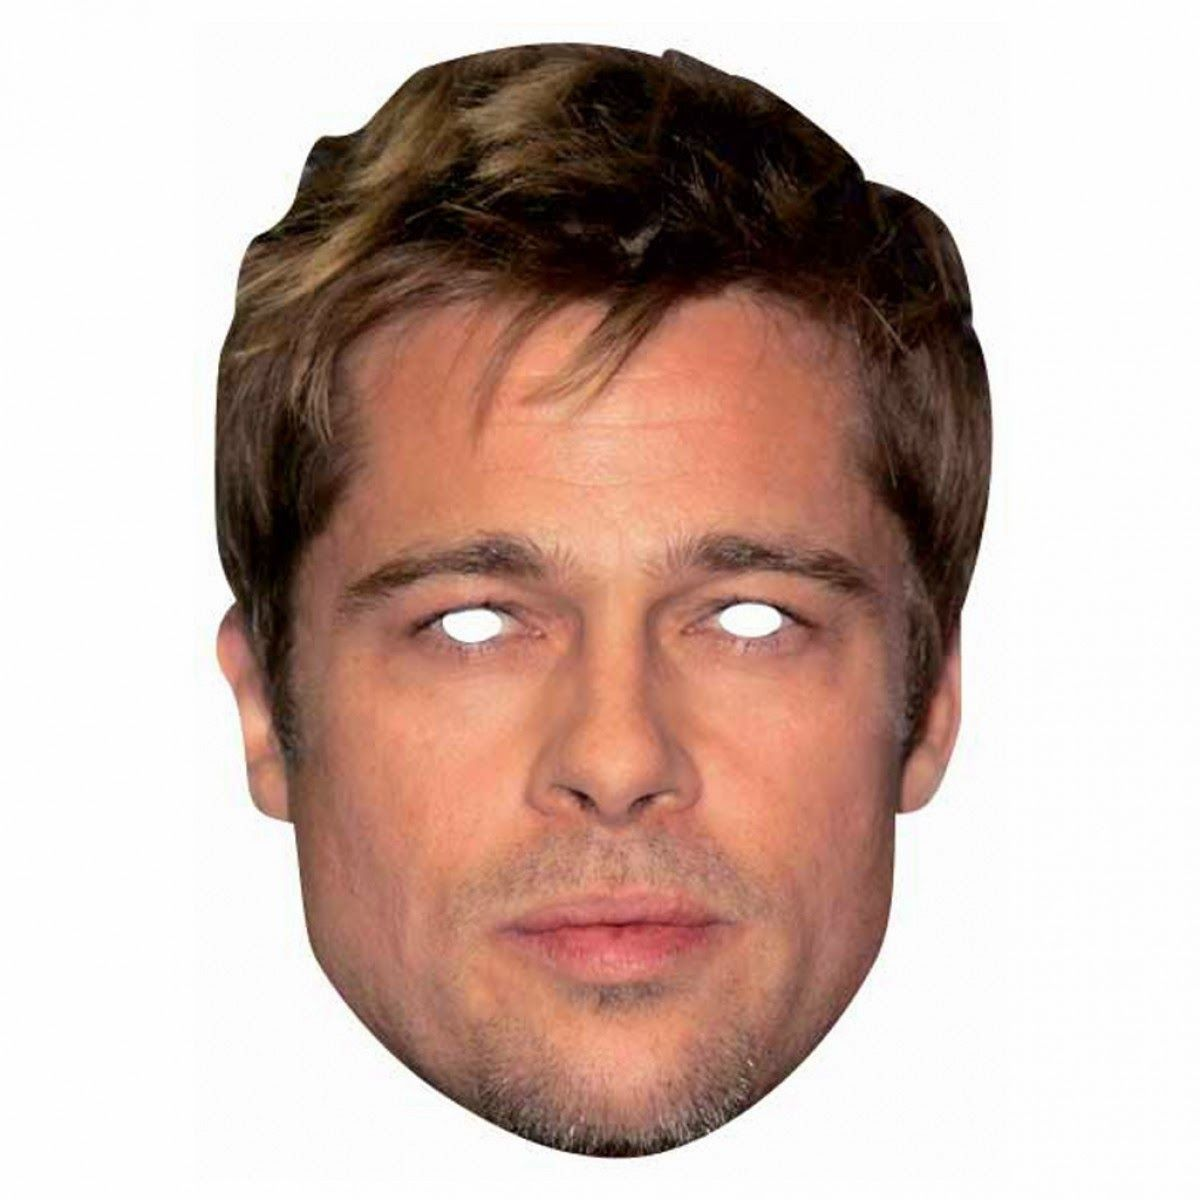 Card Face and Fancy Dress Mask David Gandy Celebrity Mask